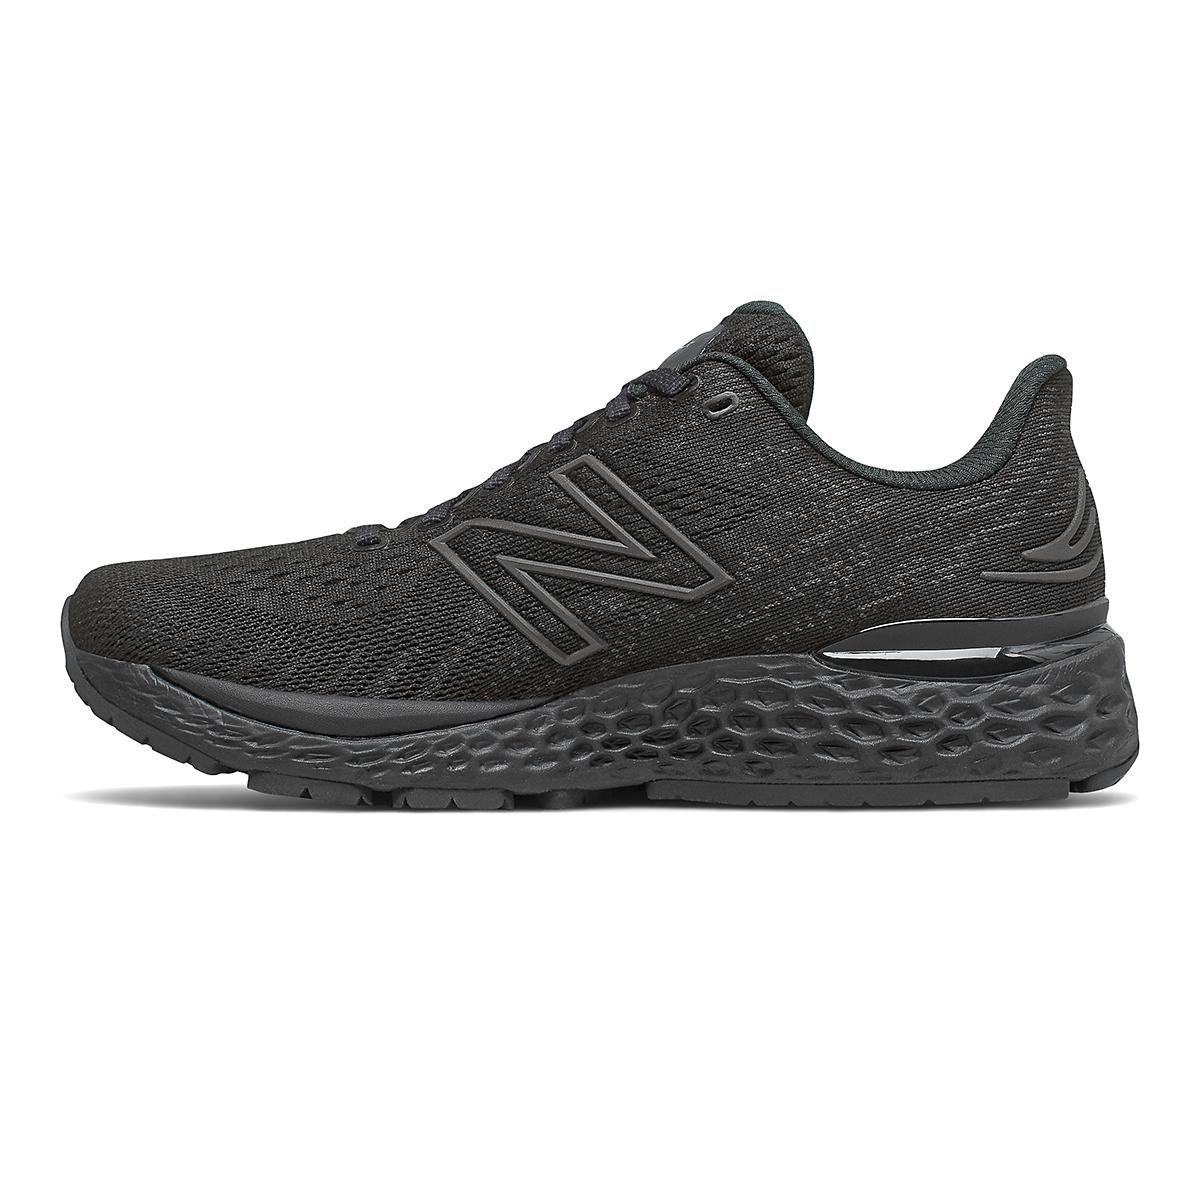 Women's New Balance 880V11 Running Shoe - Color: Black/Phantom - Size: 5 - Width: Narrow, Black/Phantom, large, image 2